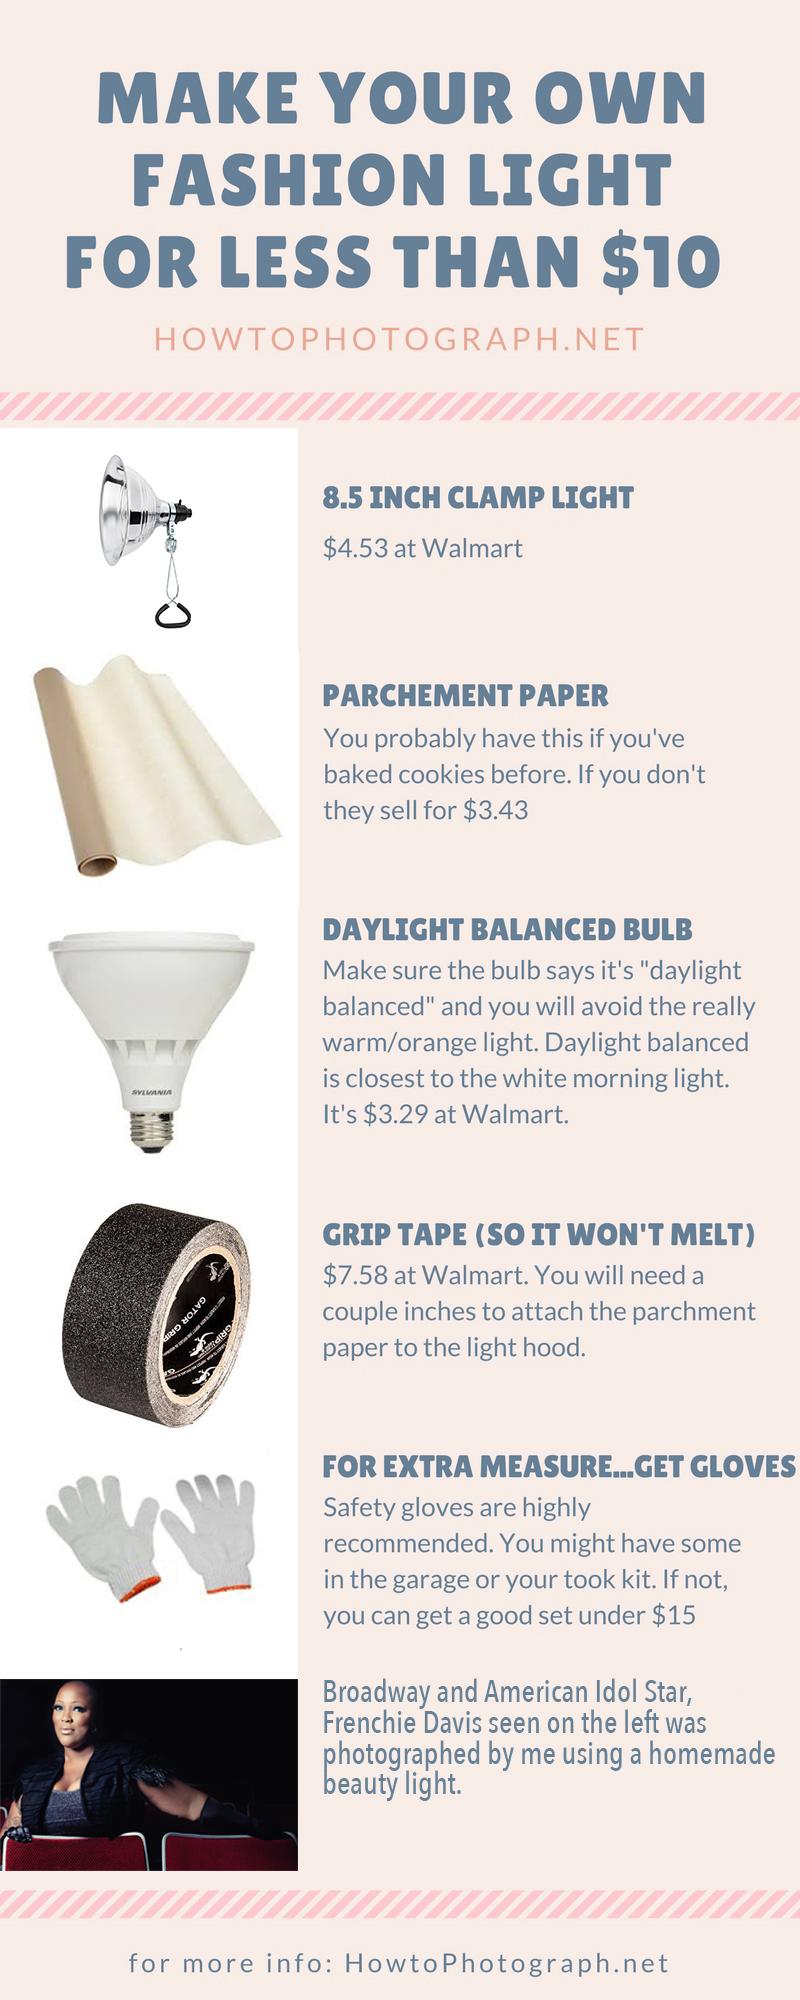 Make-DIY-Fashion-Light-infographic.jpg